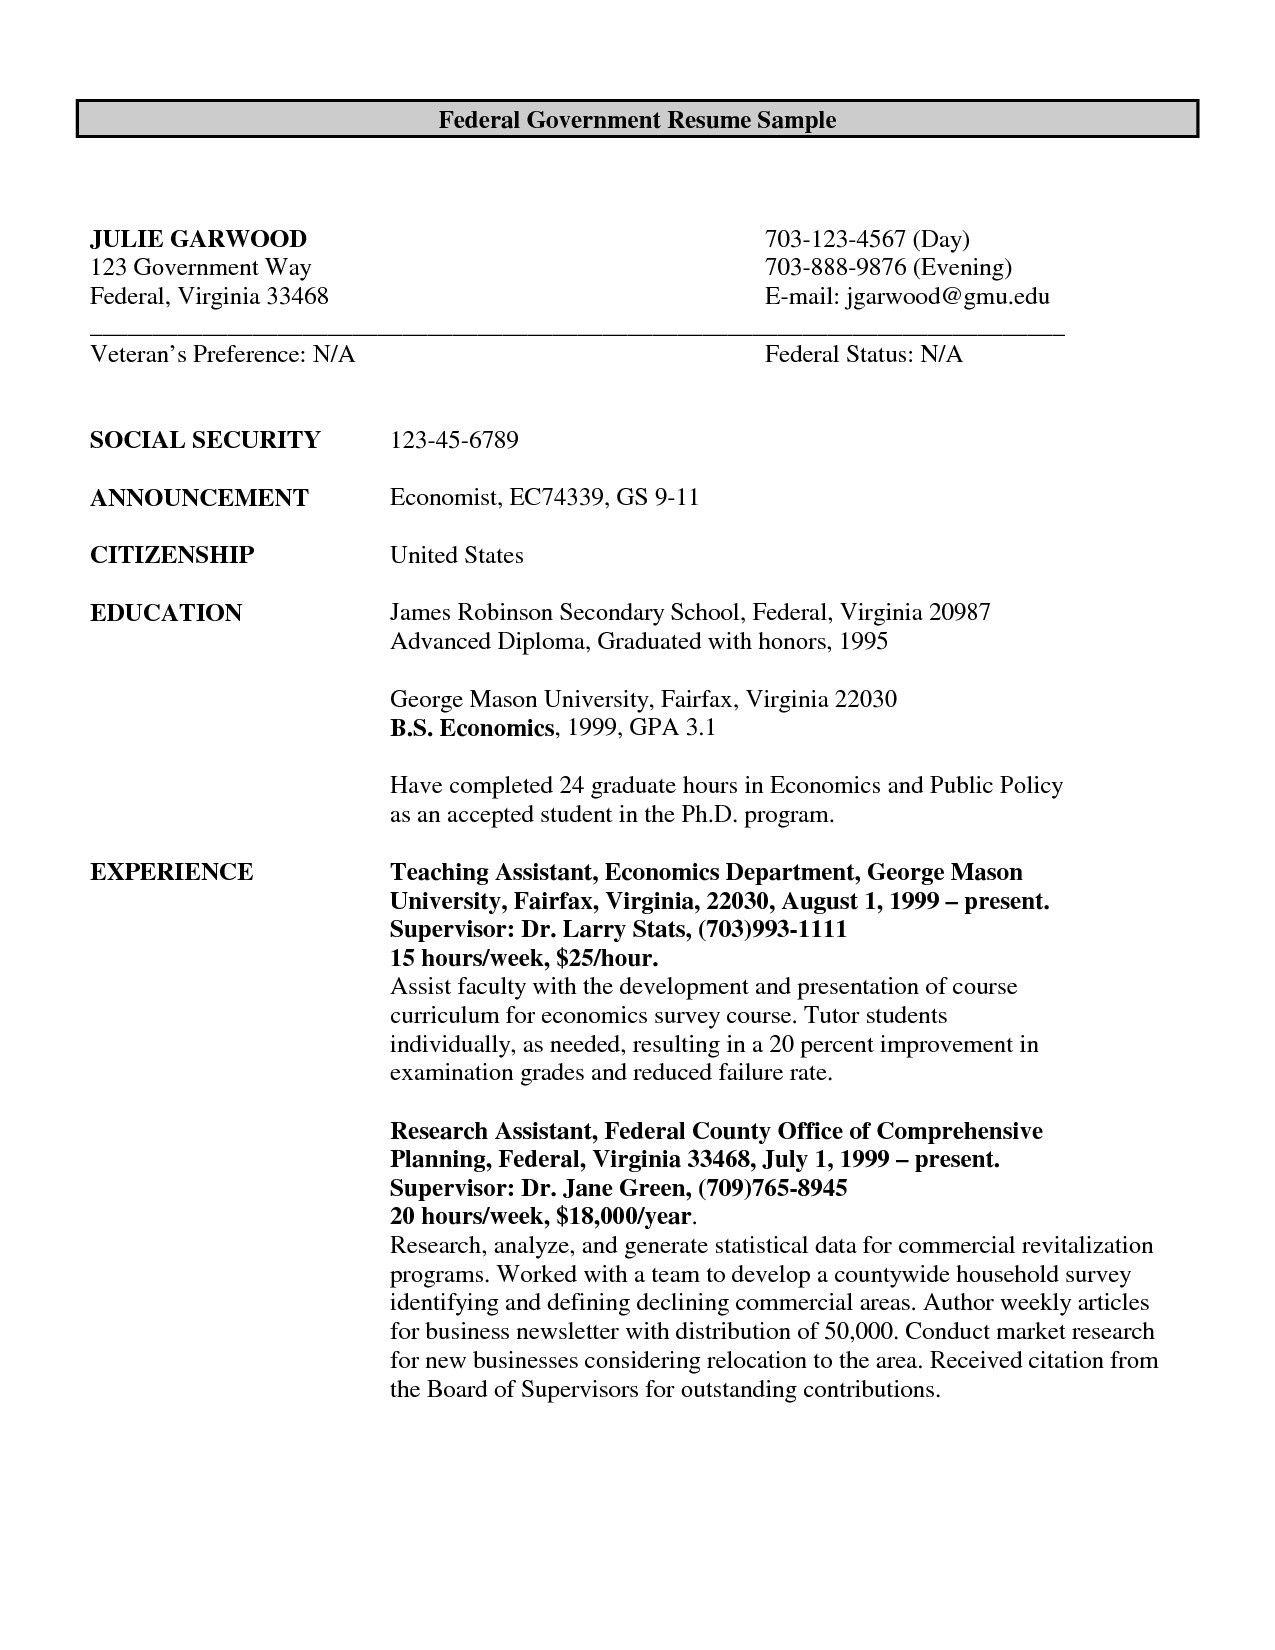 Resume Templates New Photos B Pharm Fresher Resume